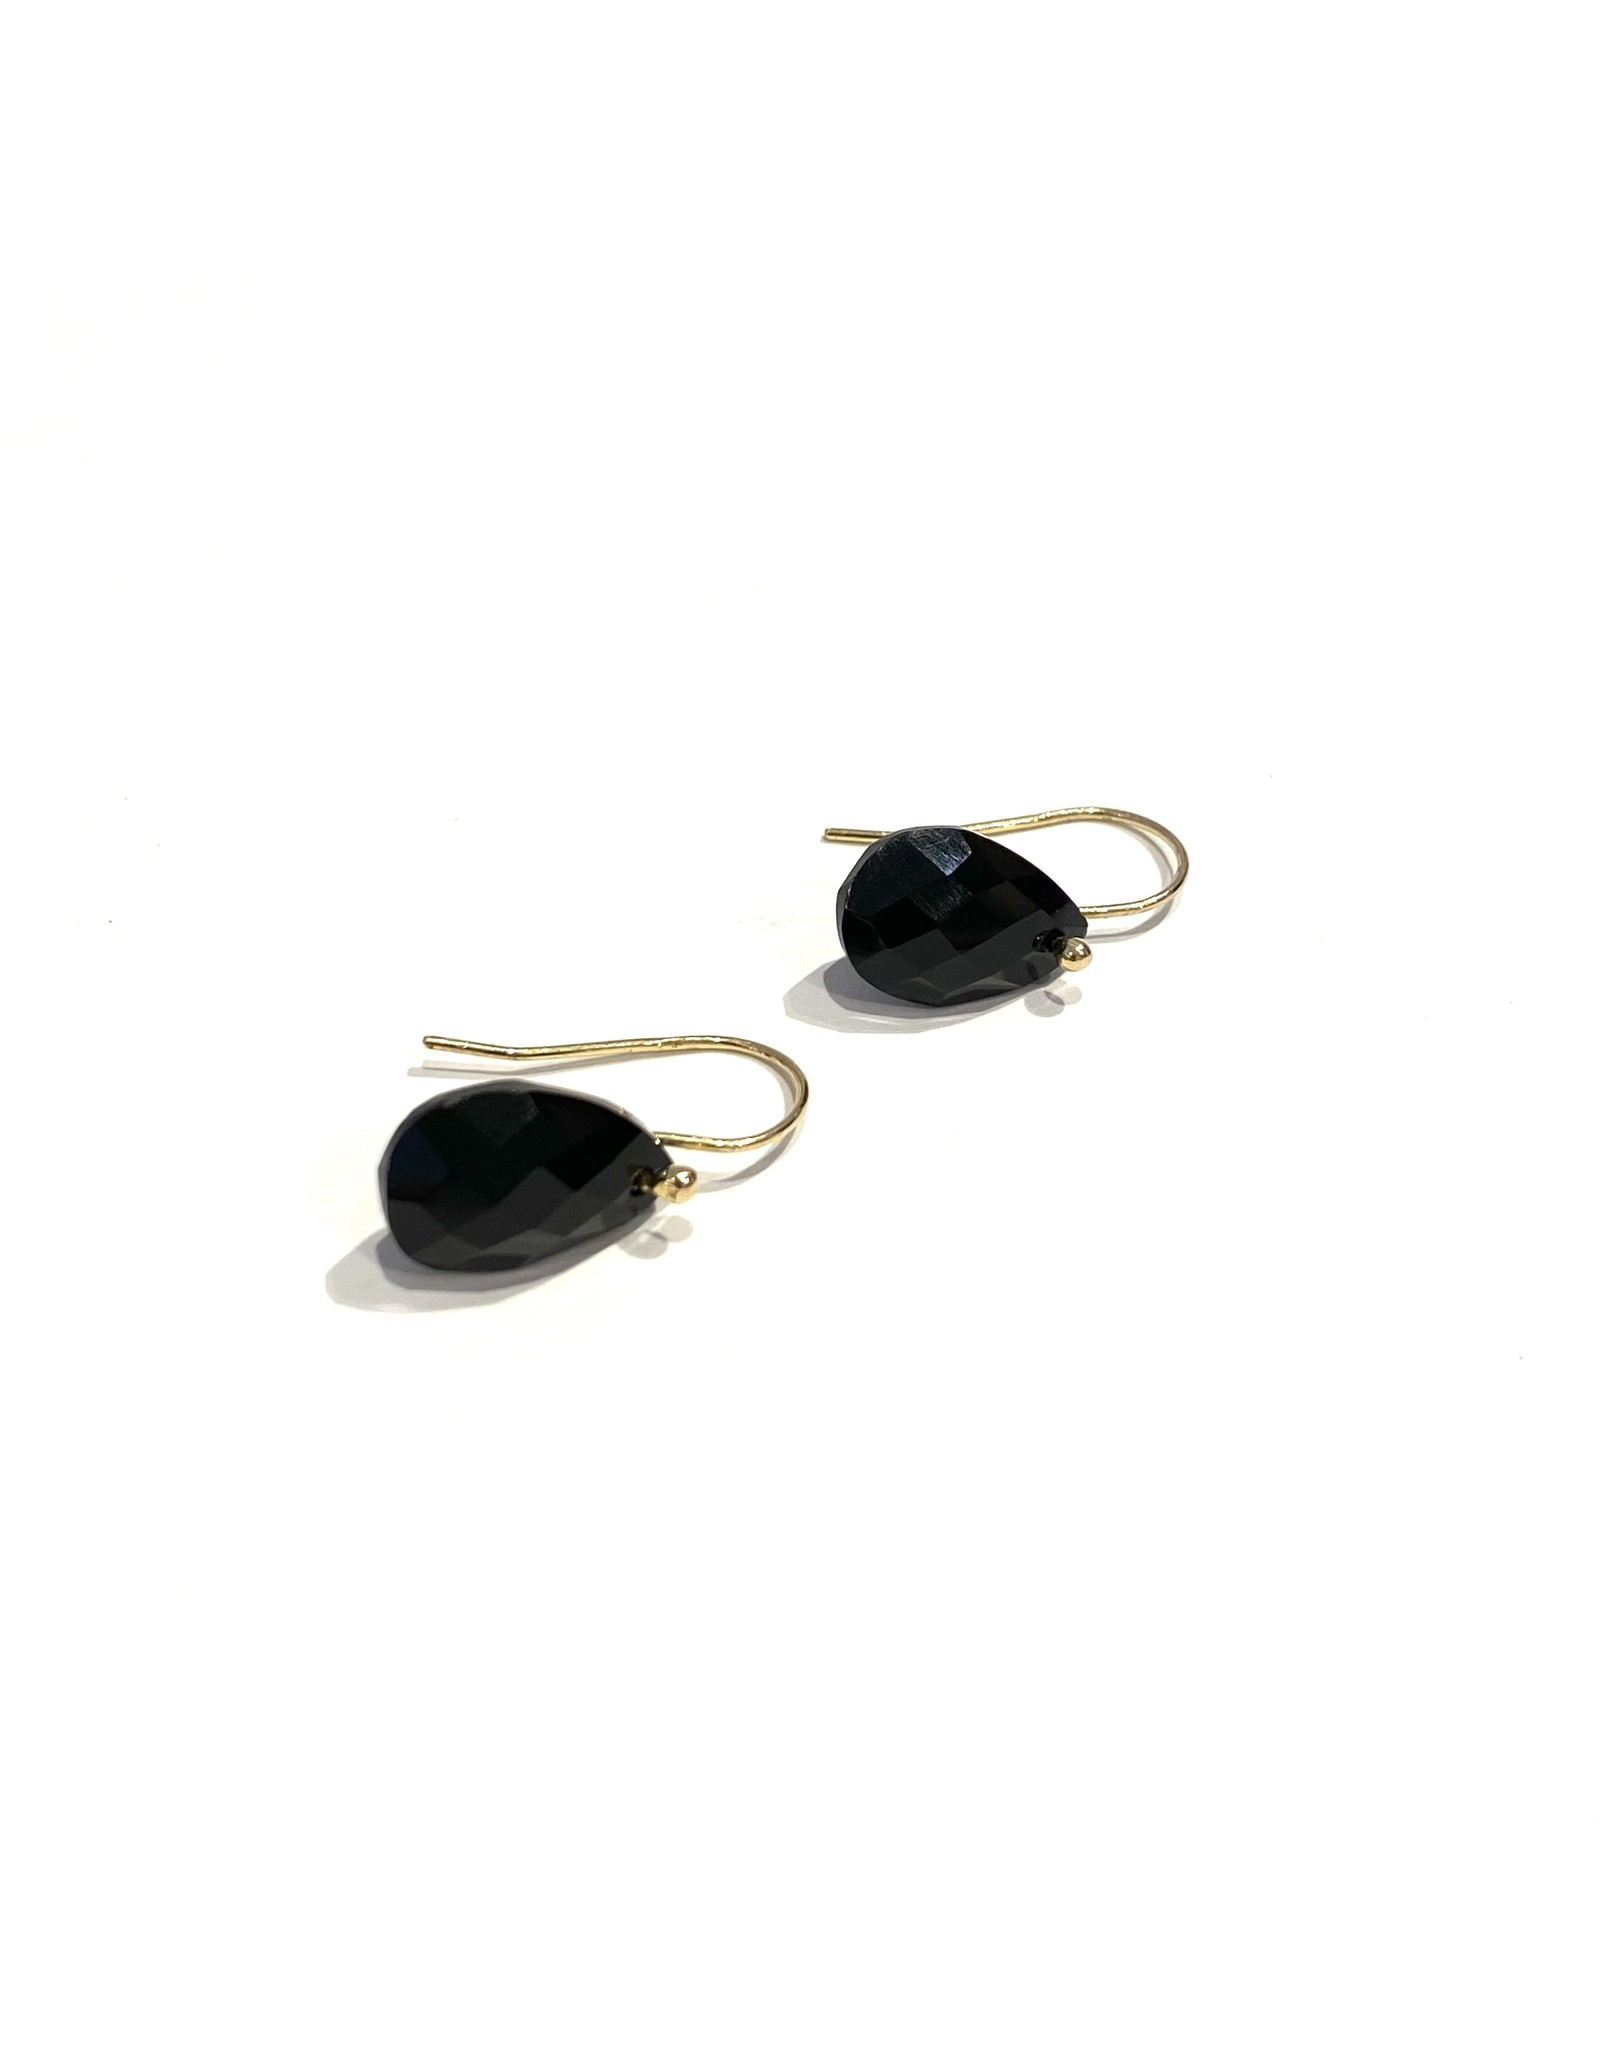 Bo Gold Earrings - Gold - Onyx